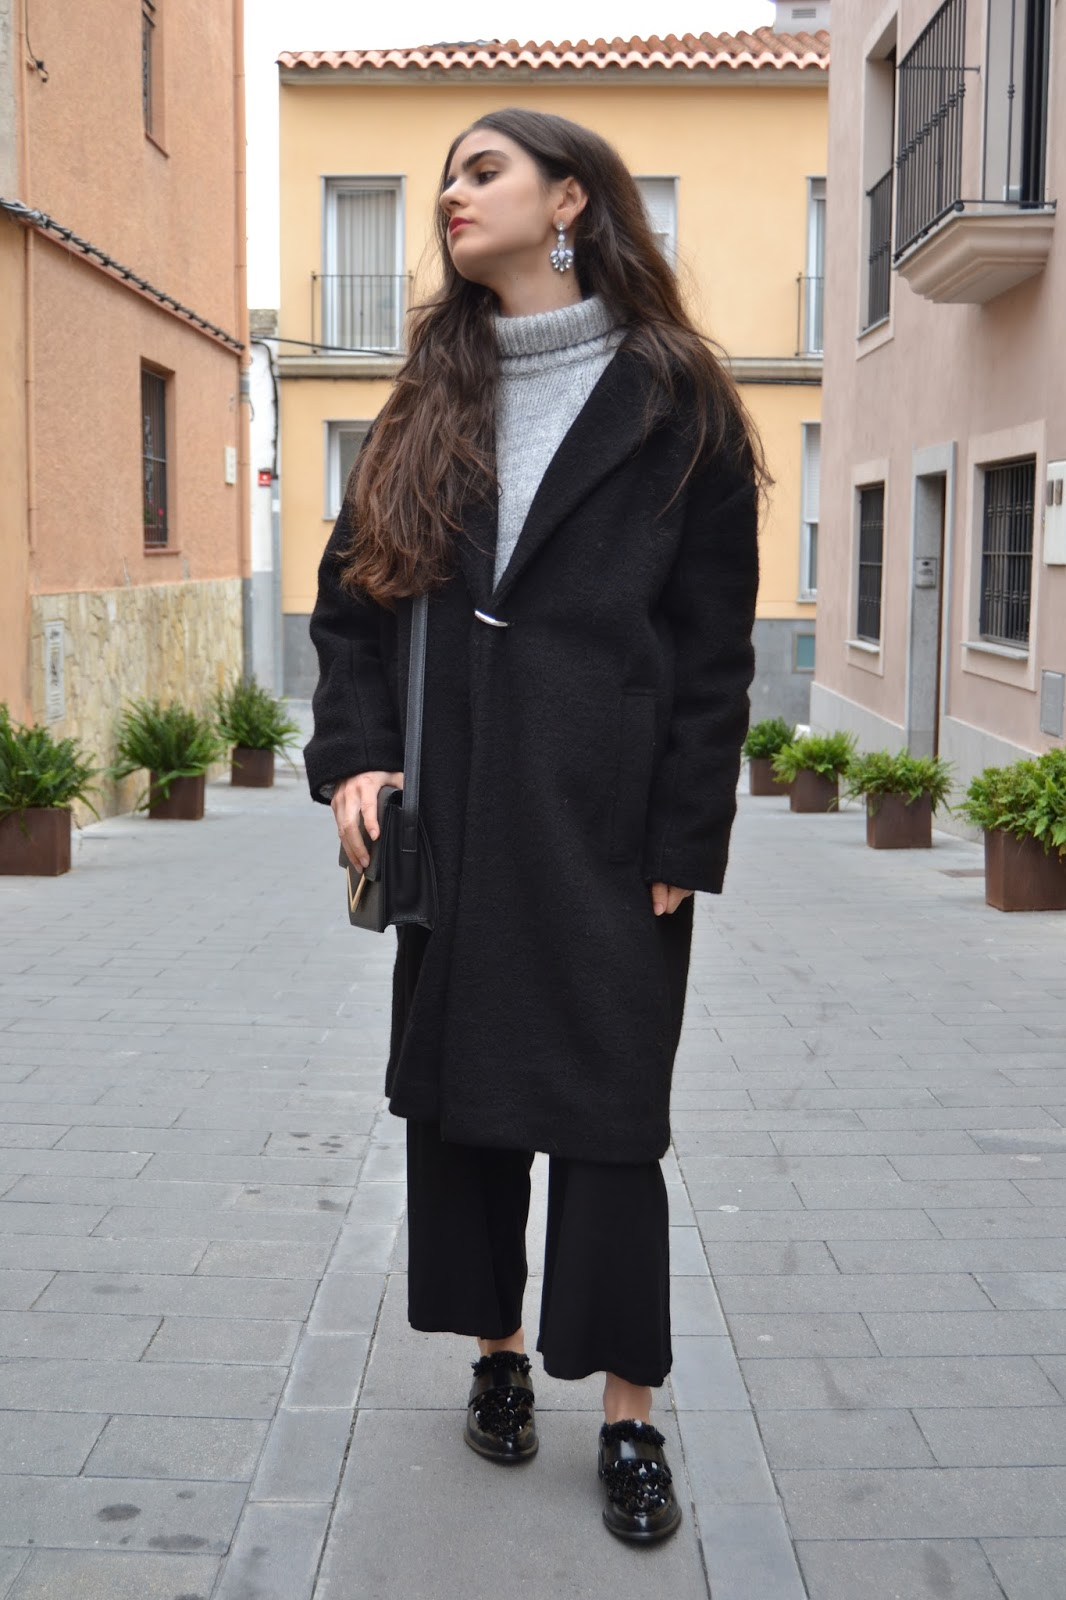 black oversized coat and earrings